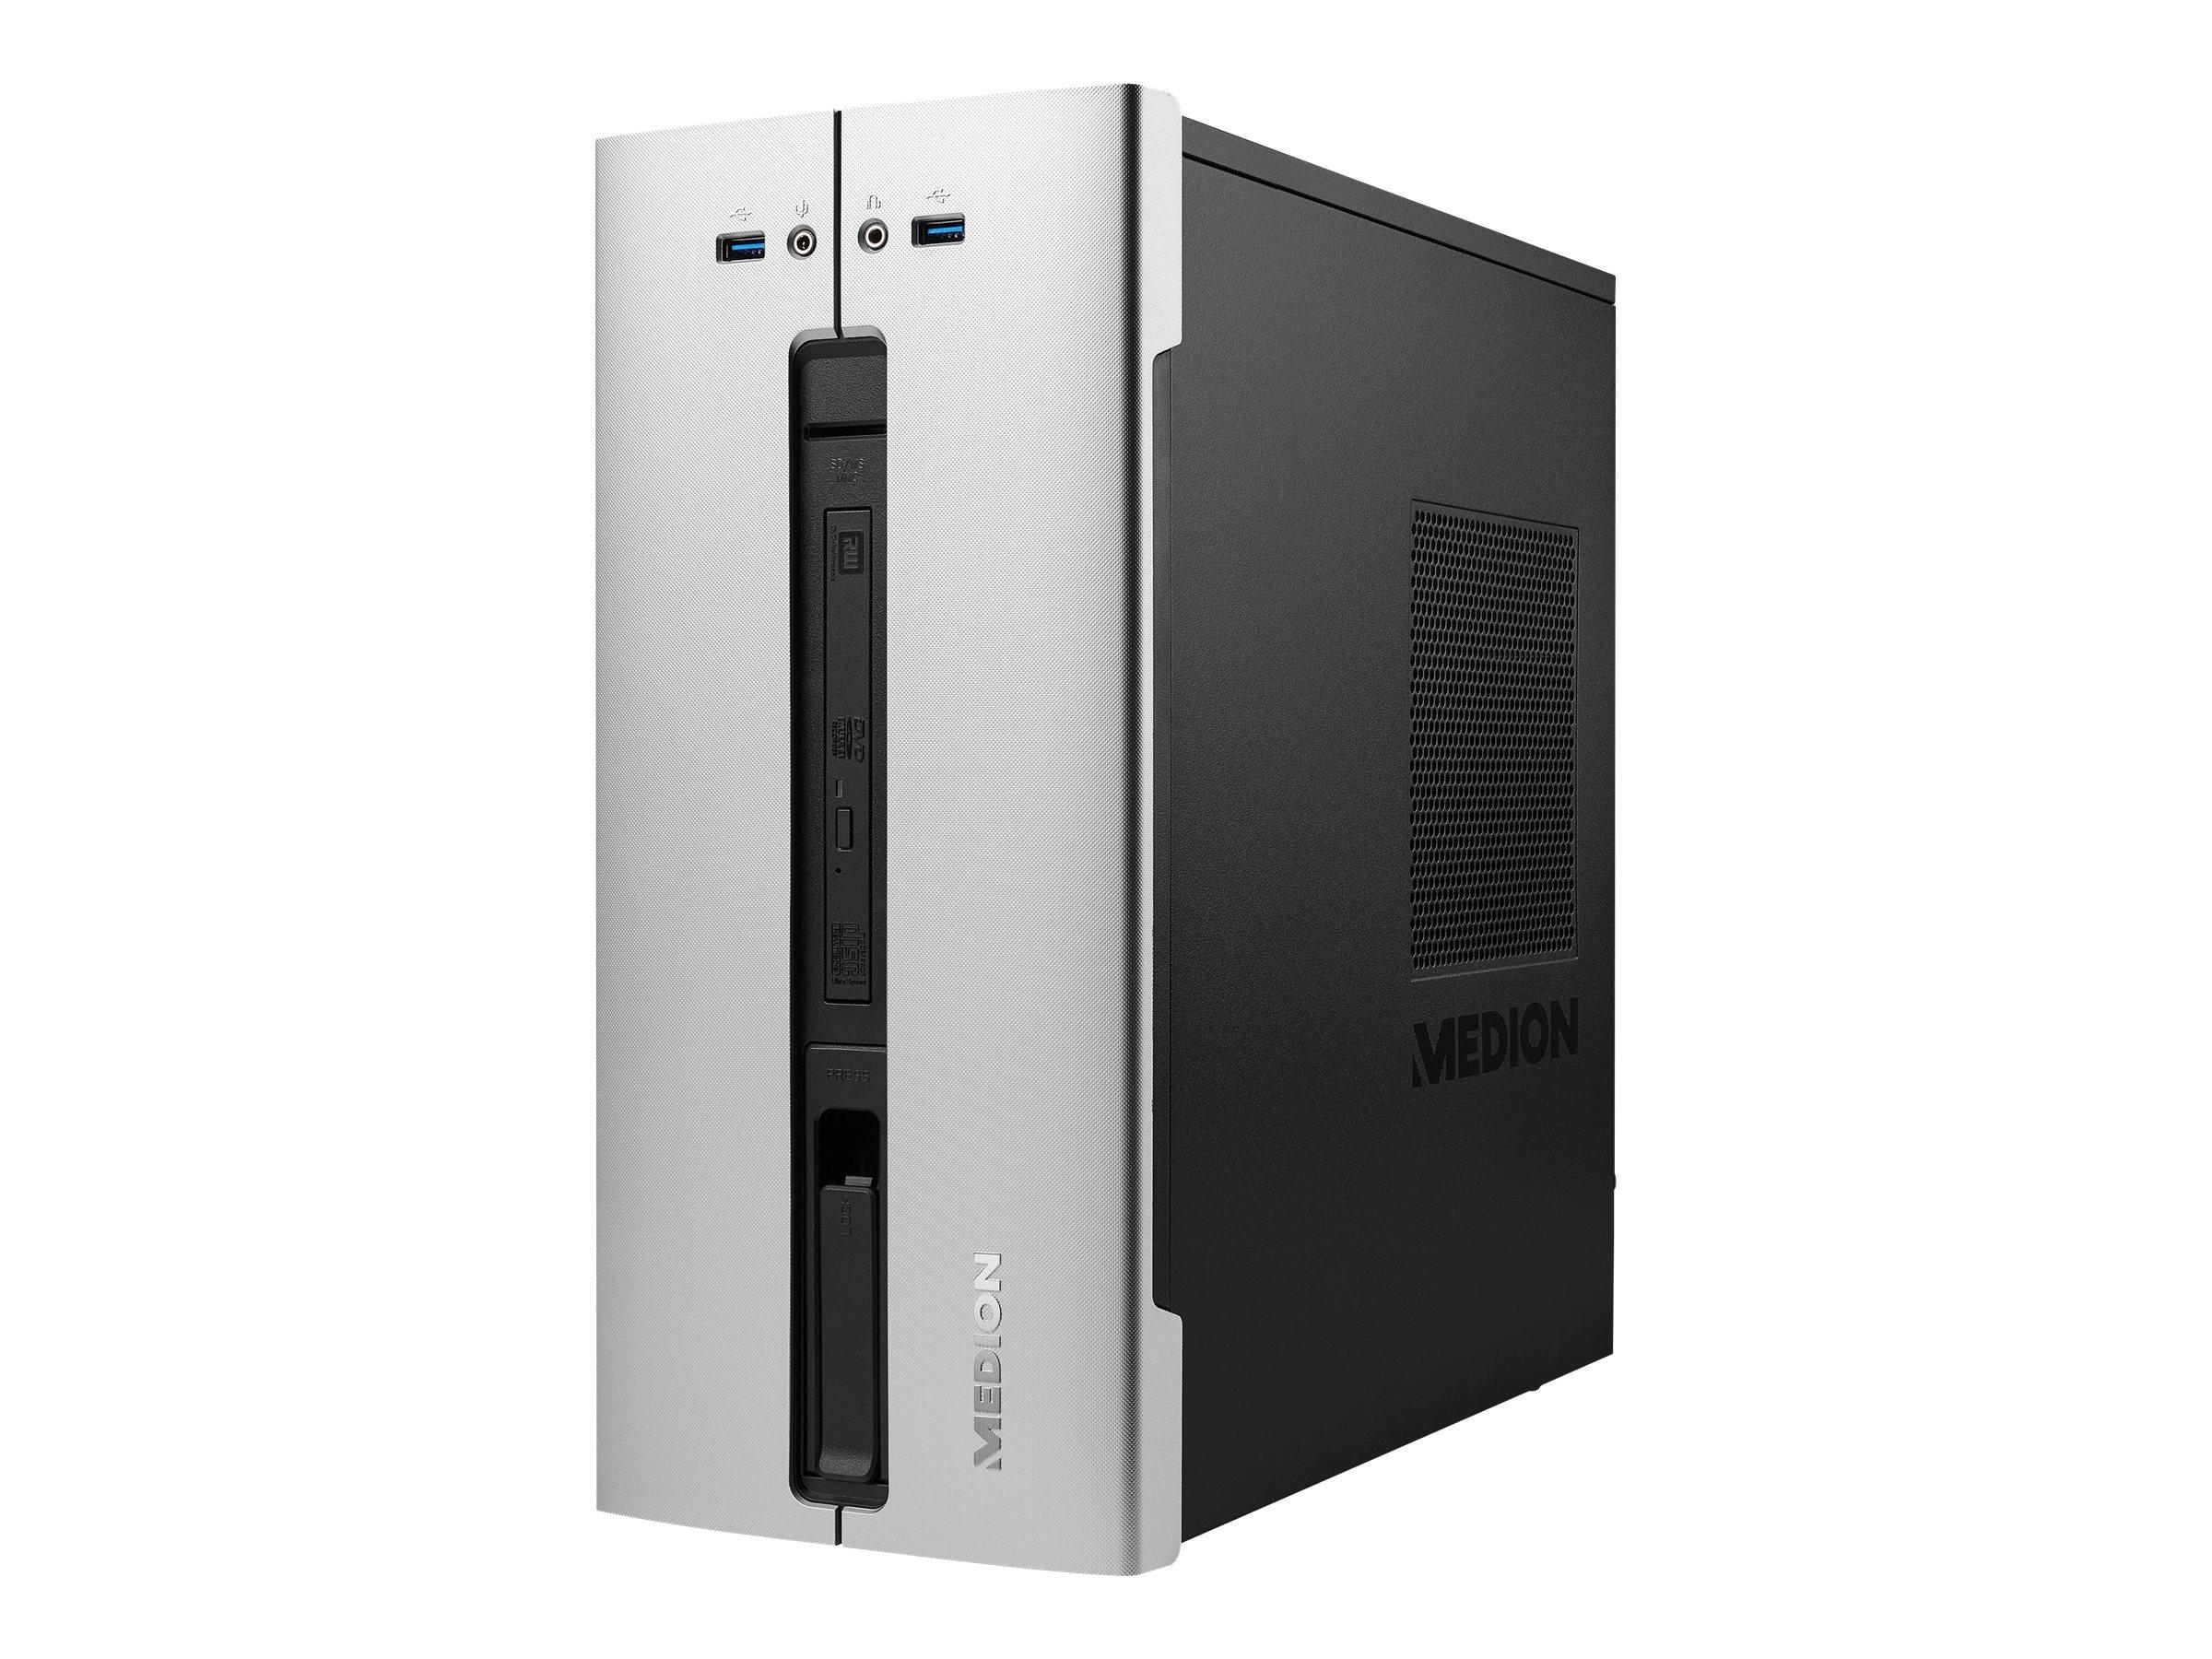 Medion Akoya P40008 - Tower - 1 x Core i3 8100 / 3.6 GHz - RAM 8 GB - HDD 1 TB - DVD-Writer